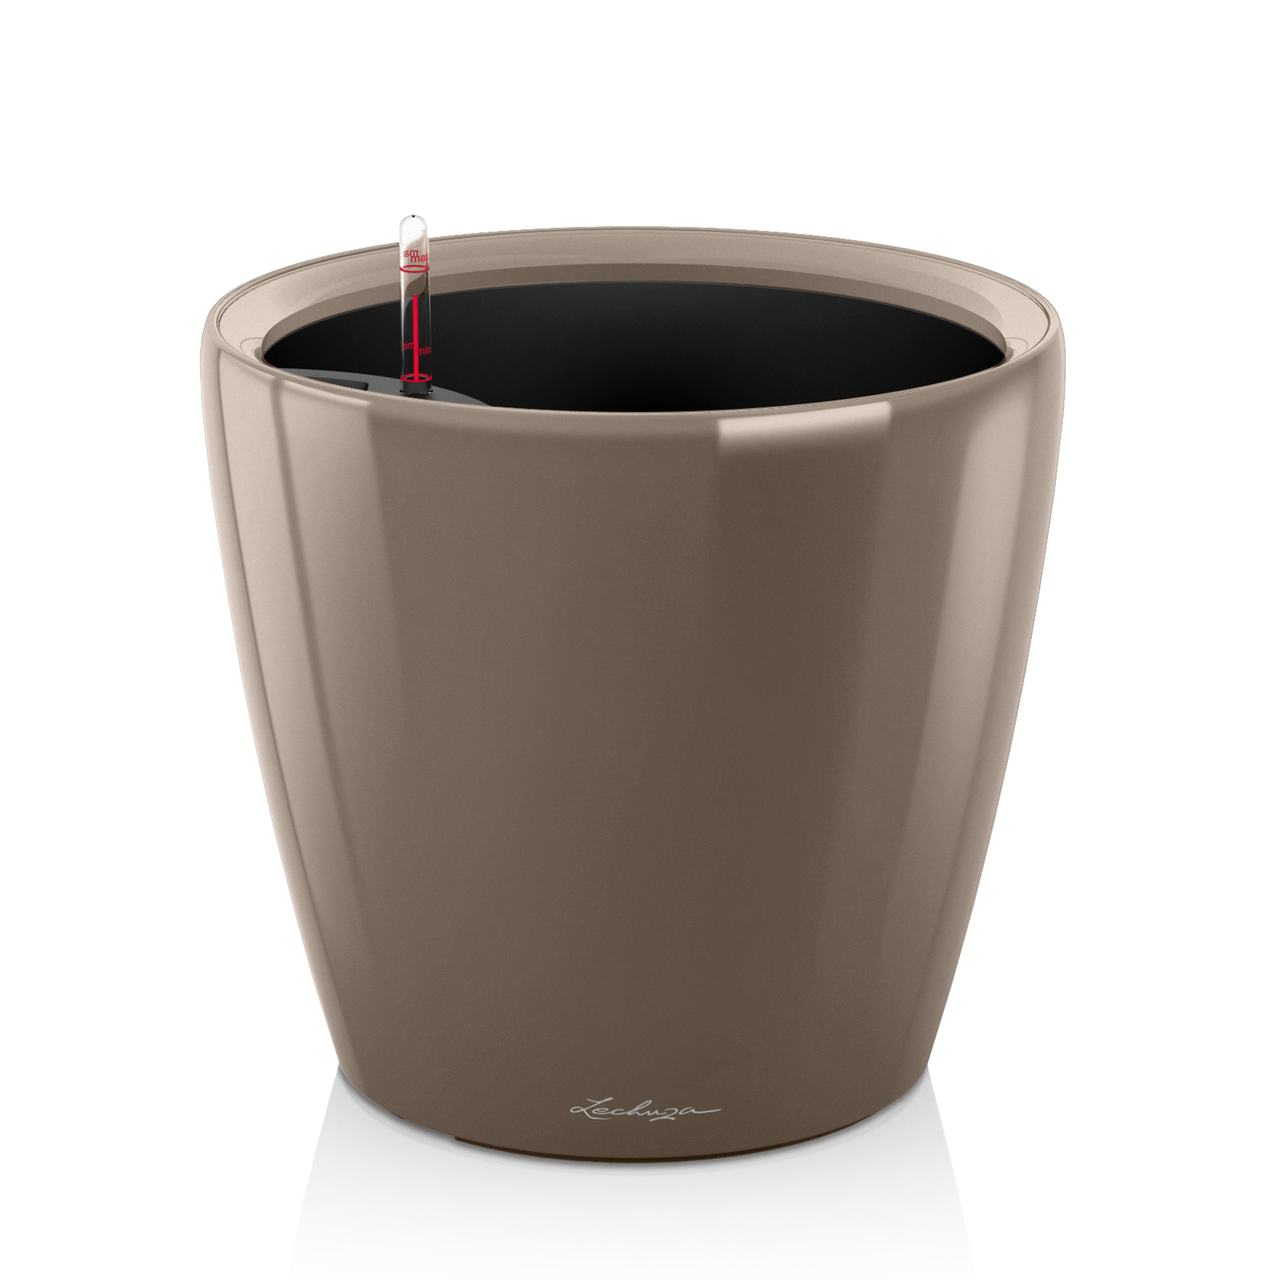 Кашпо Lechuza Classico Premium LS 35 серо-коричневый